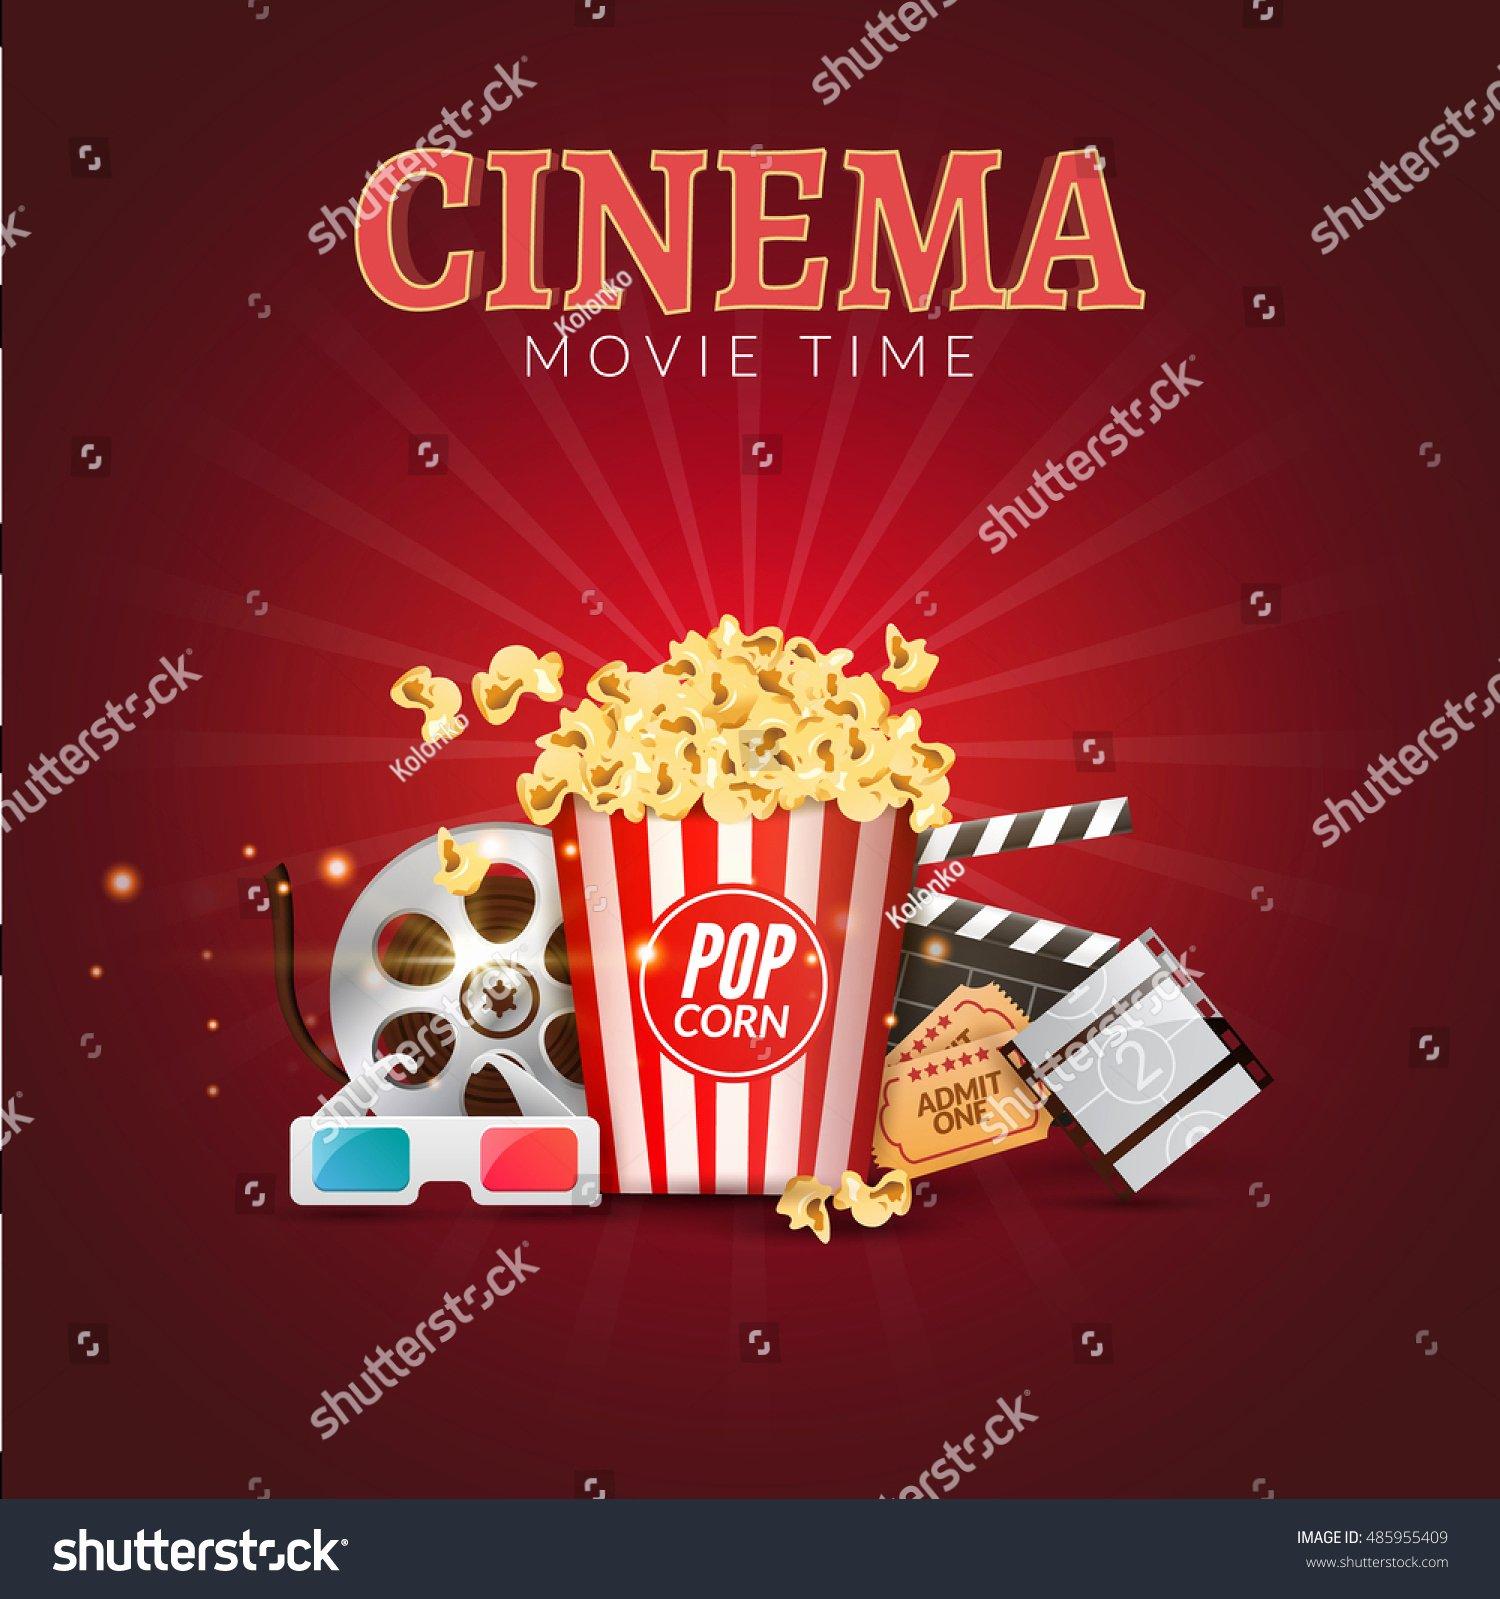 Movie Poster Design Template Lovely Cinema Movie Vector Poster Design Template Stock Vector